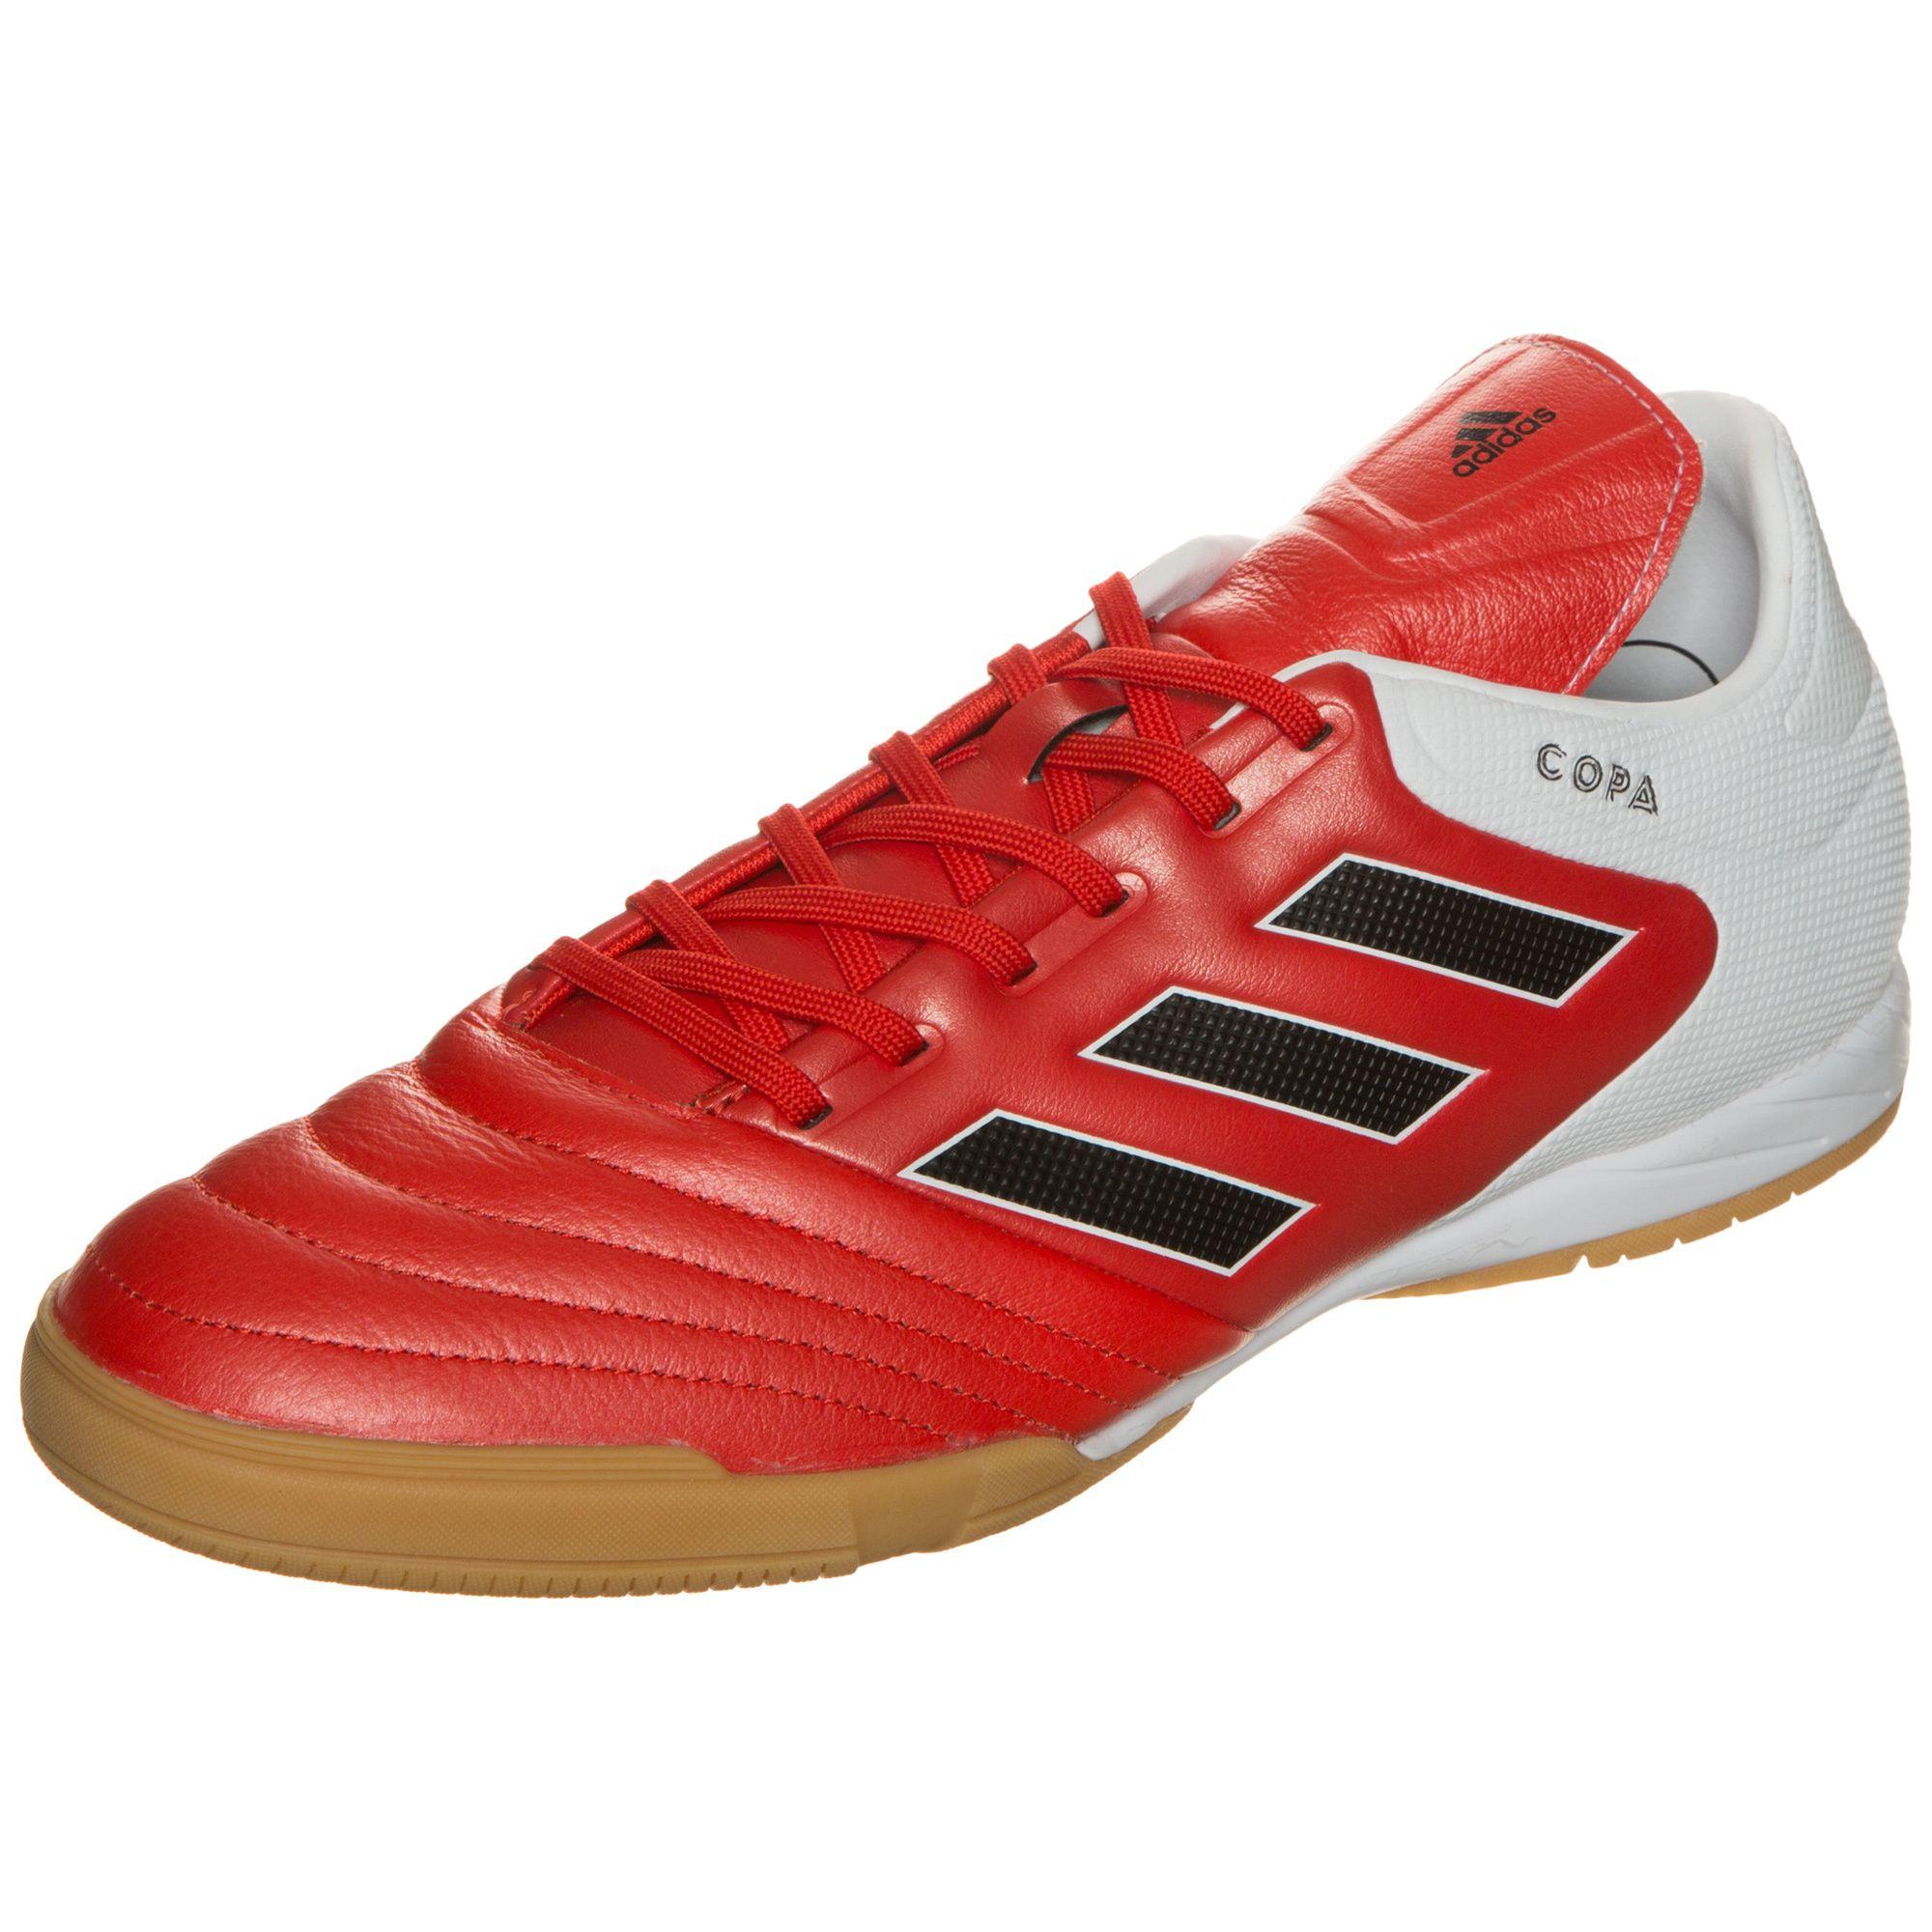 ADIDAS PERFORMANCE adidas Performance Copa 17.3 Indoor Fußballschuh Herren